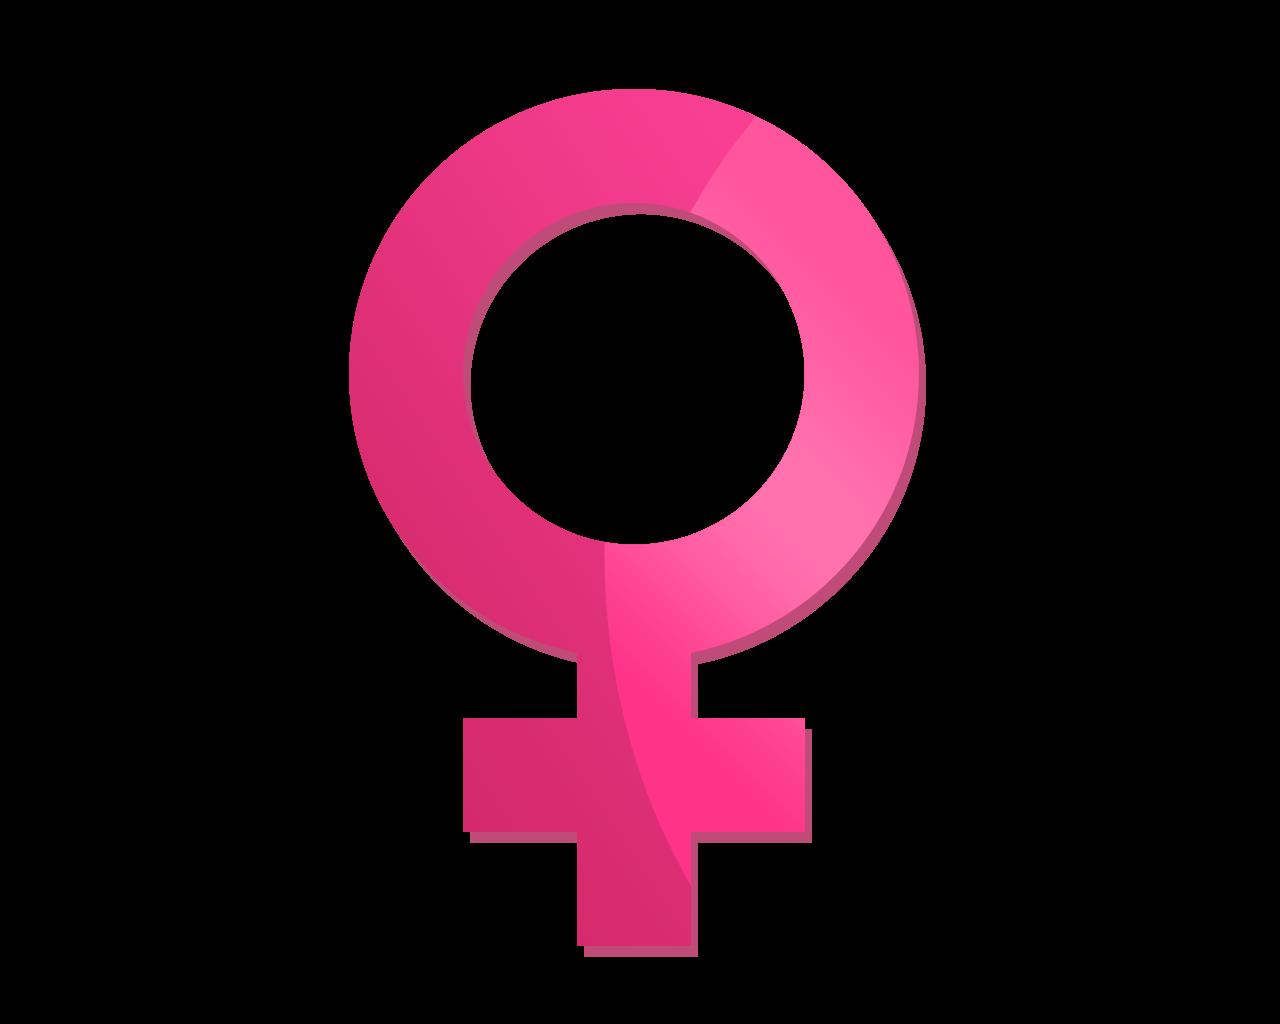 Gender roles in Islam